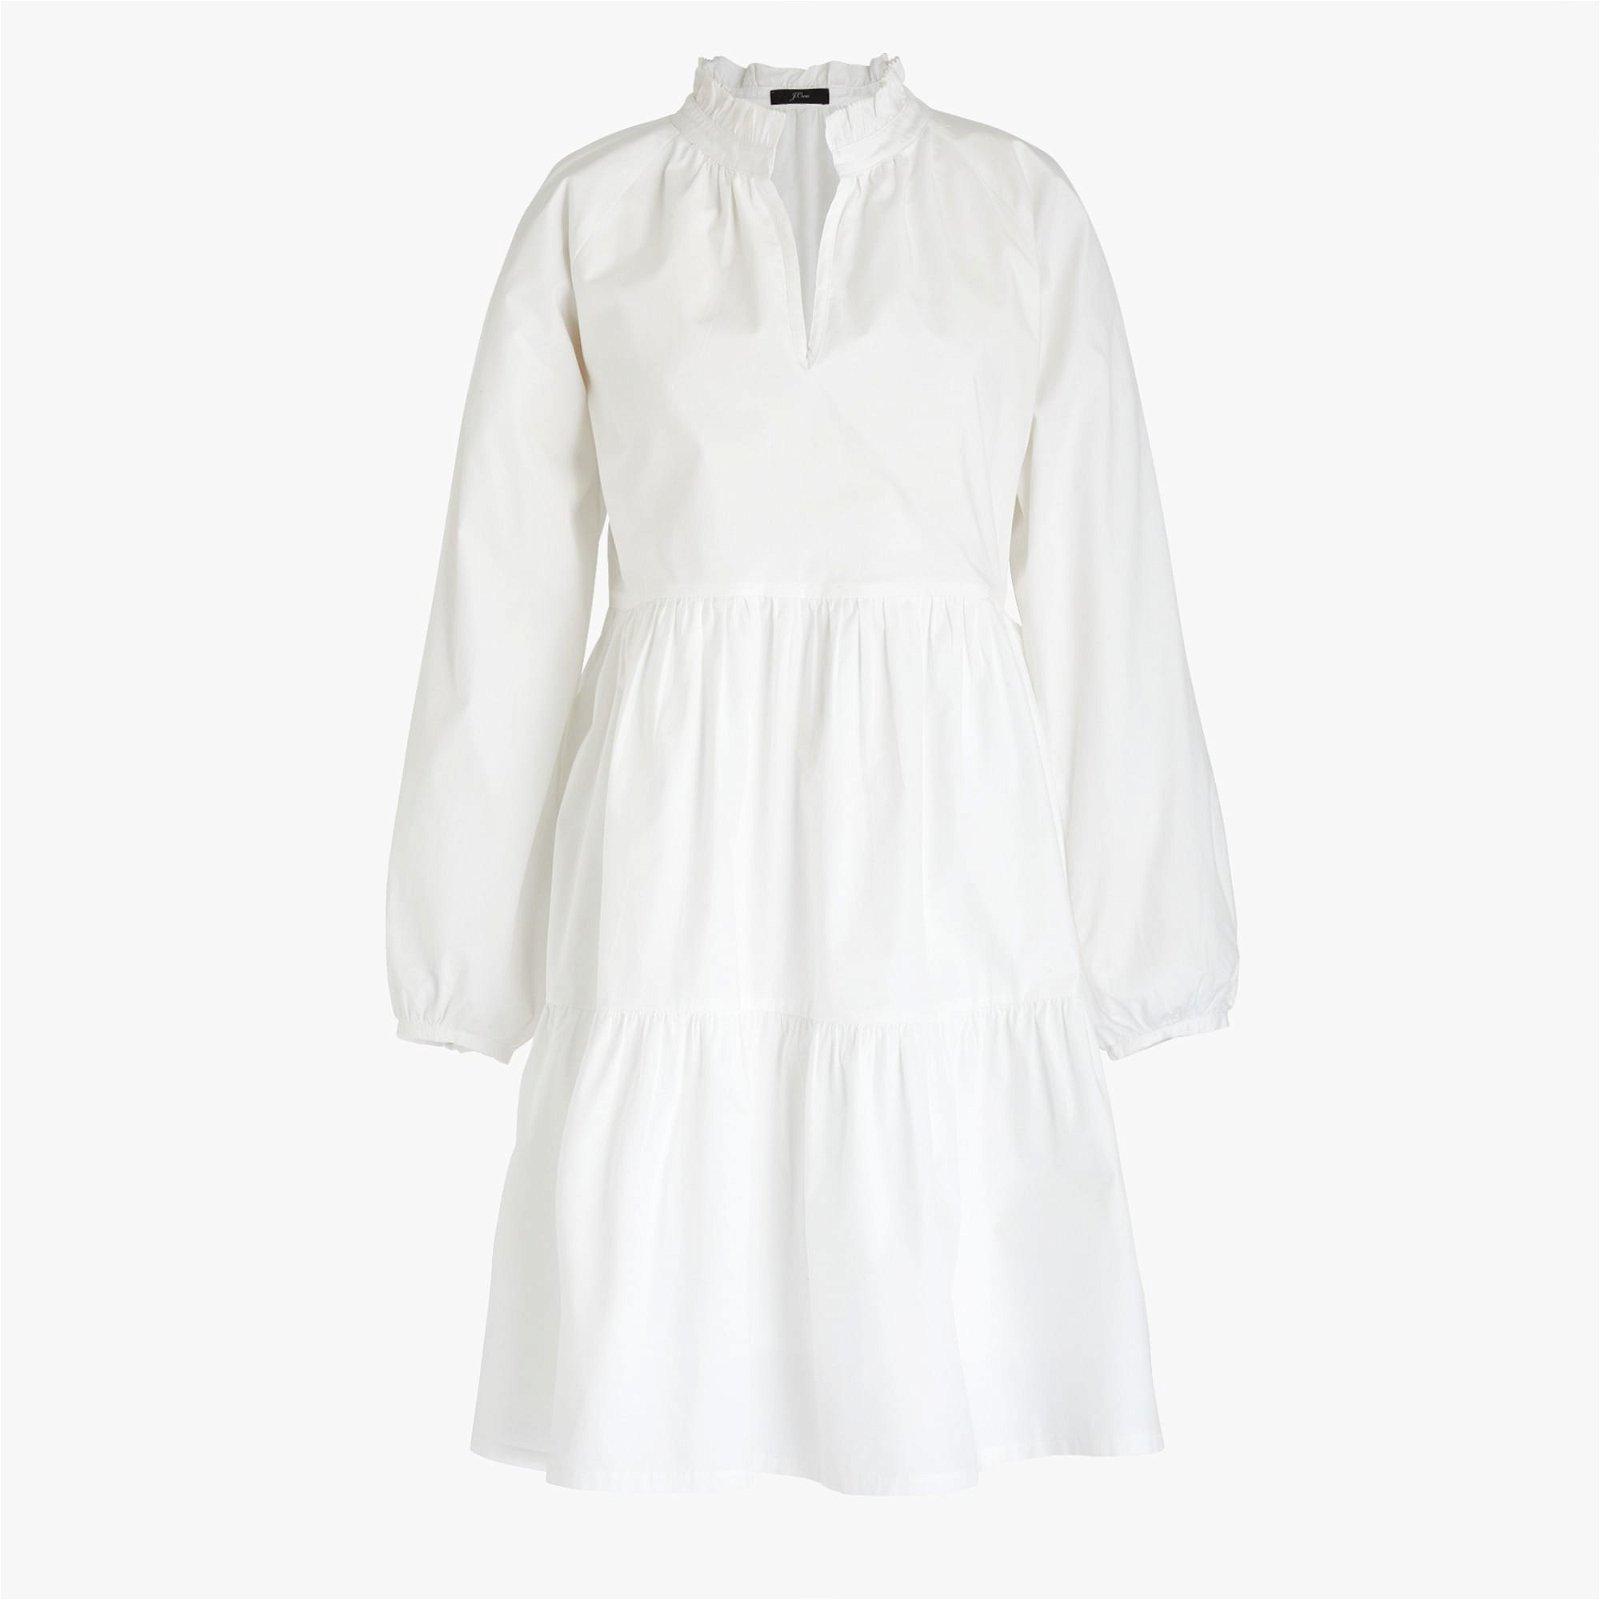 Petite tiered popover dress in cotton poplin